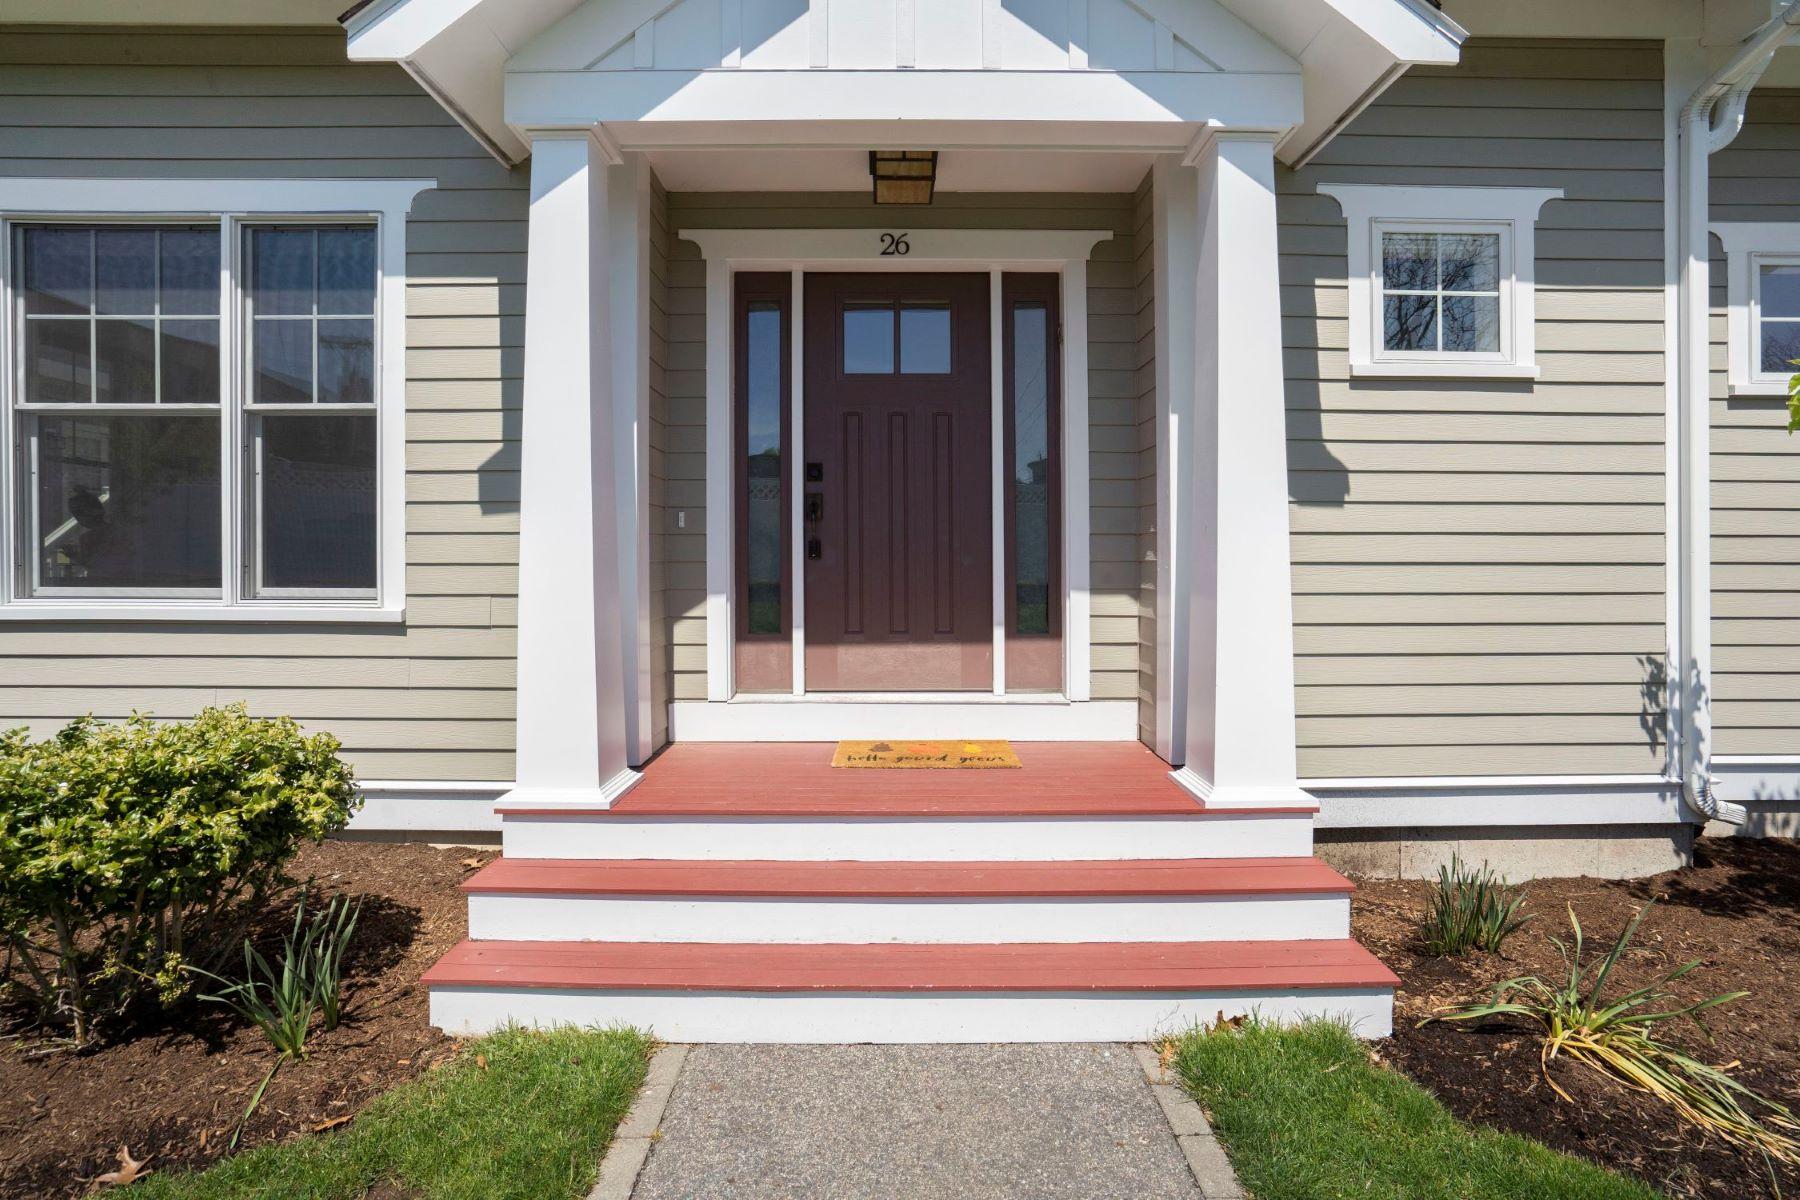 townhouses για την Πώληση στο 26 Putnam Street 26 Putman Street, Needham, Μασαχουσετη 02494 Ηνωμένες Πολιτείες